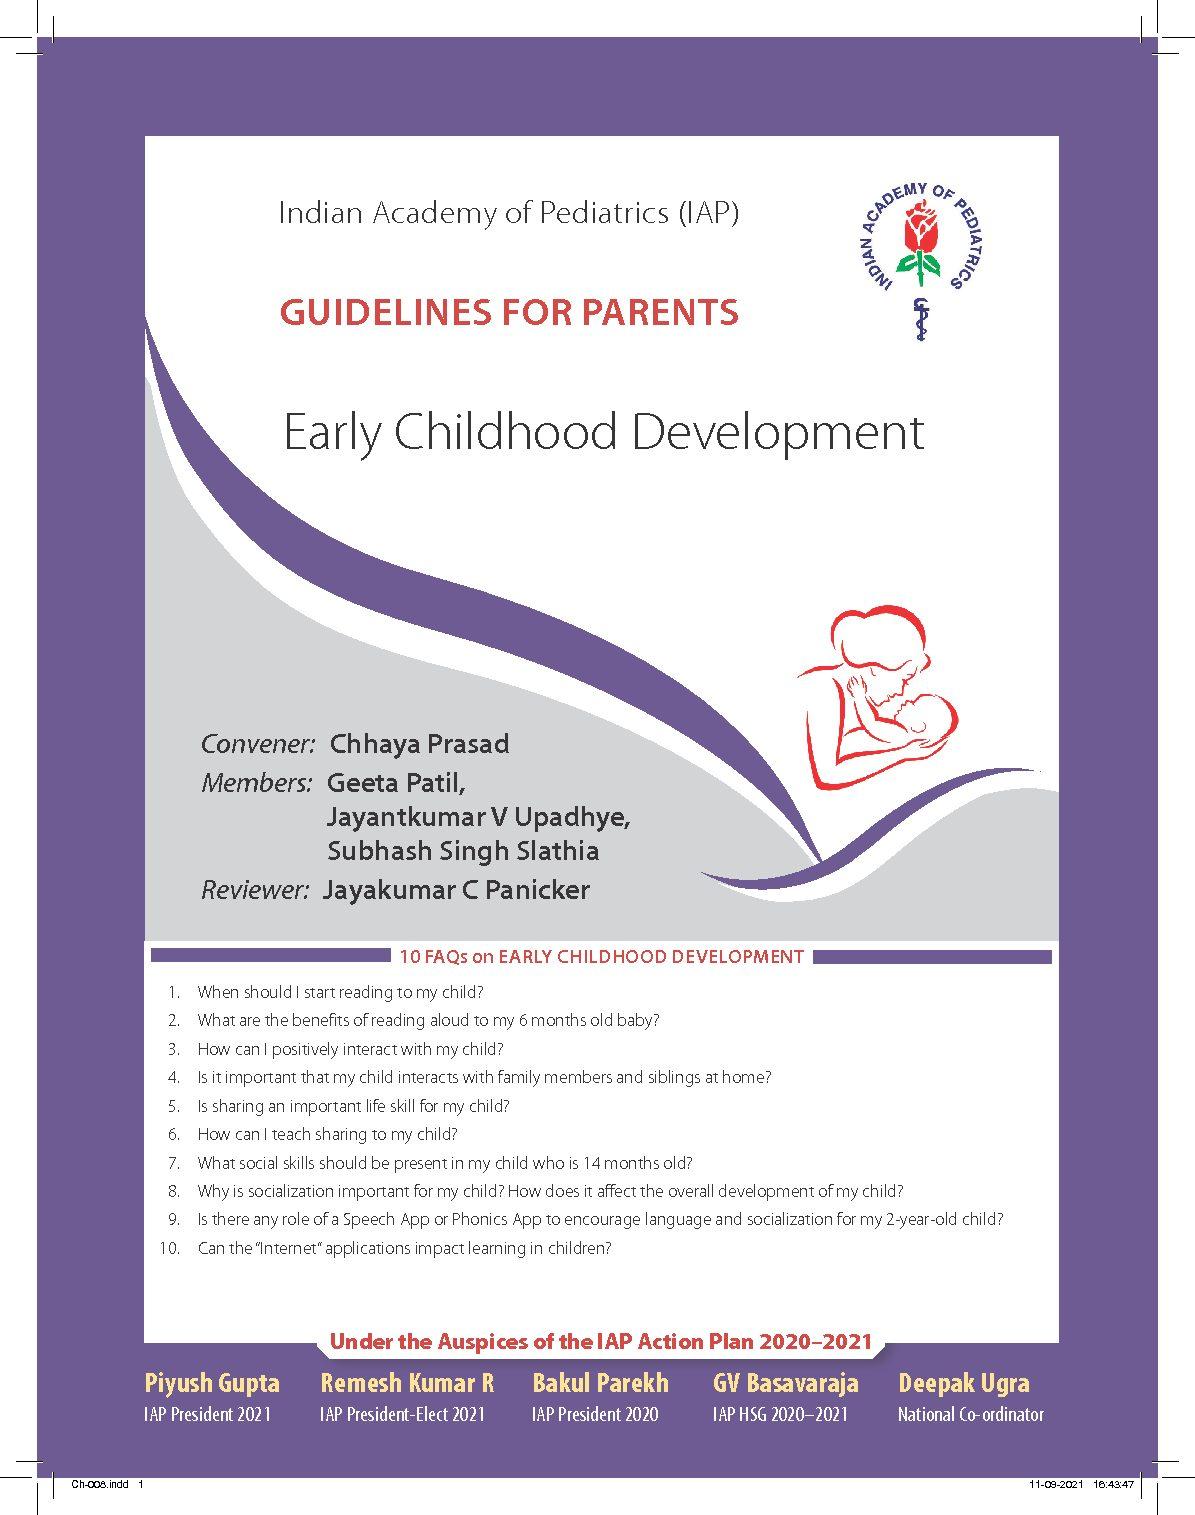 Ch-008ECD-IAP-Parental-Guidelines-Early-Childhood-Development-1-pdf.jpg